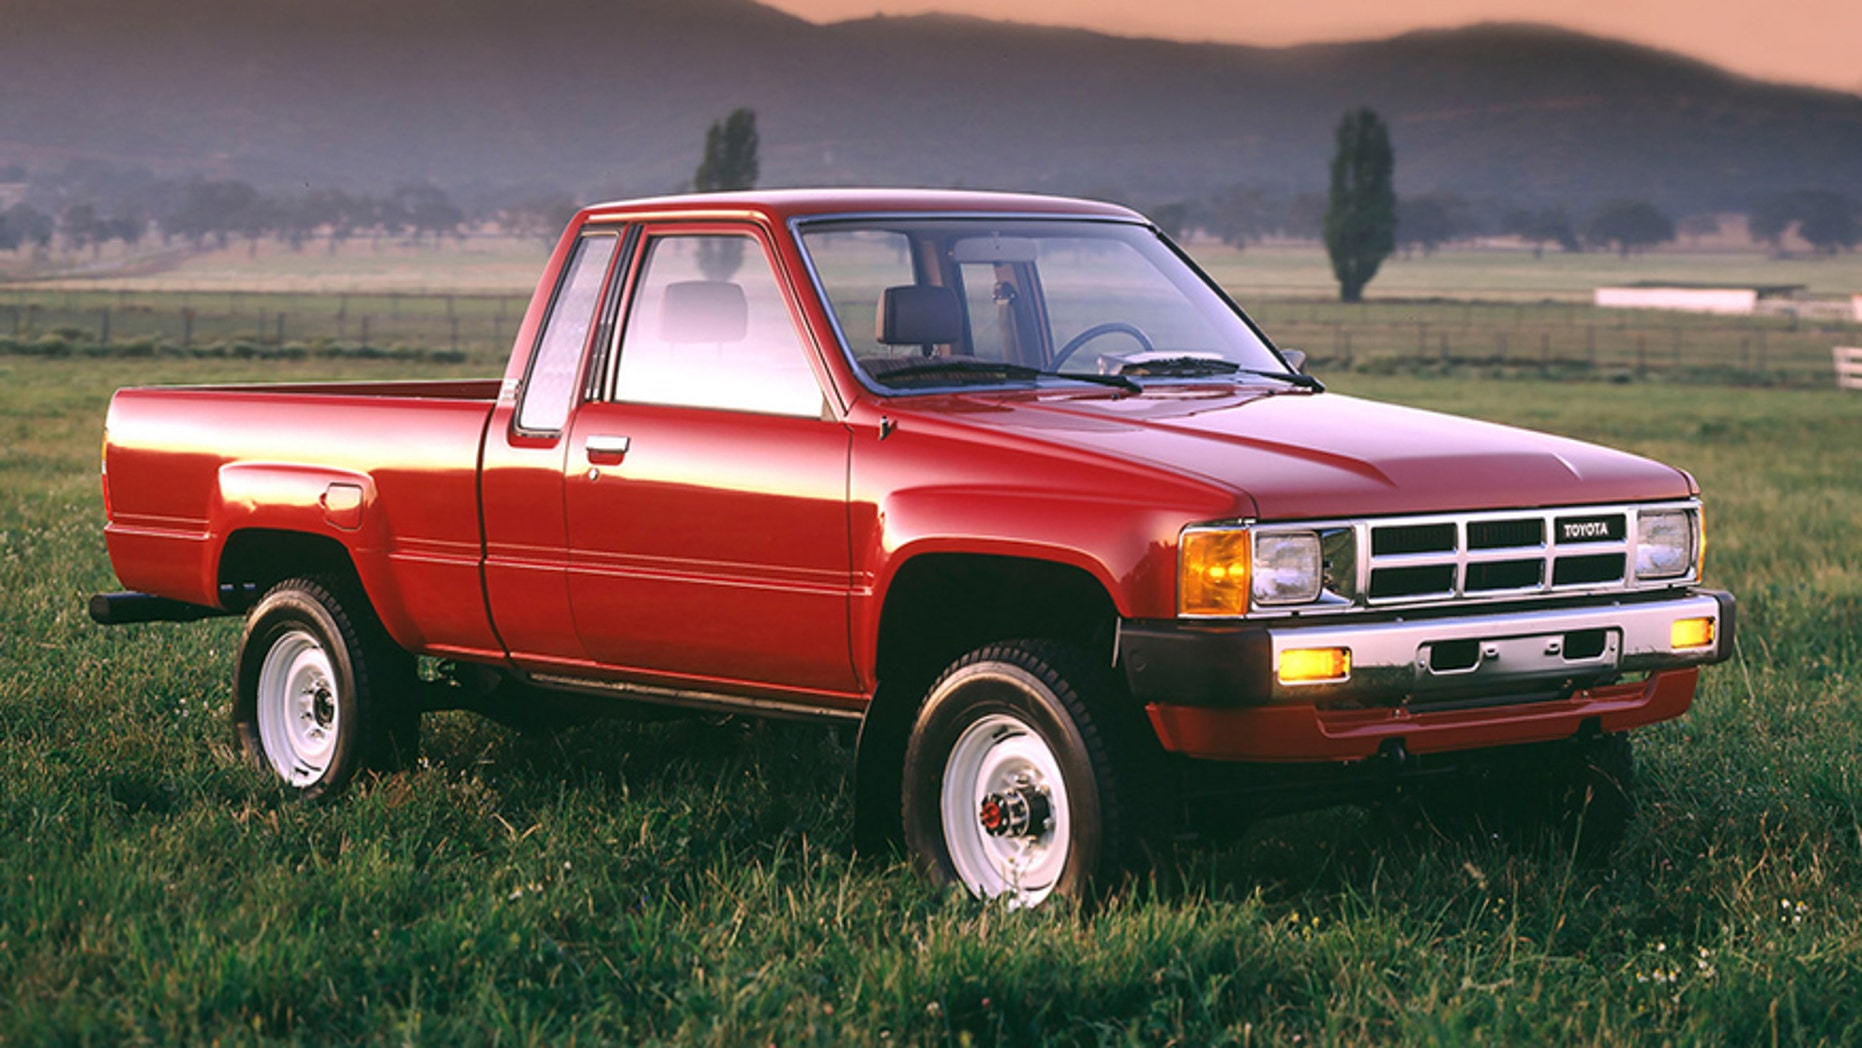 1984 Toyota truck